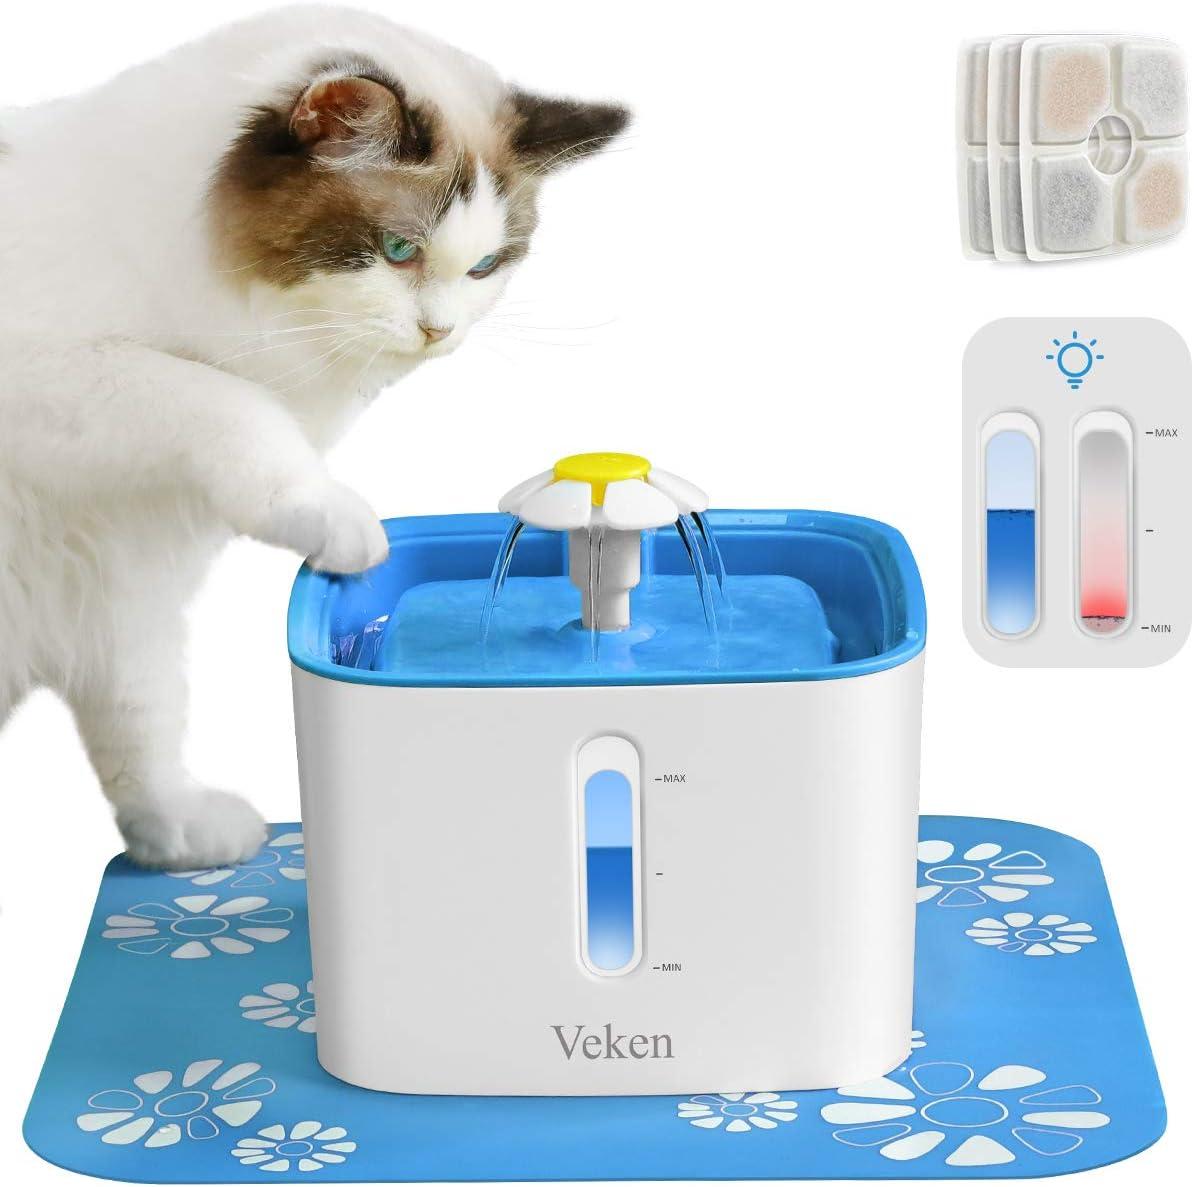 Veken 84oz/2.5L Pet Fountain & 4 Pack Replacement Filters & 2 Pack Replacement Pre-Filter Sponges Set (Blue)